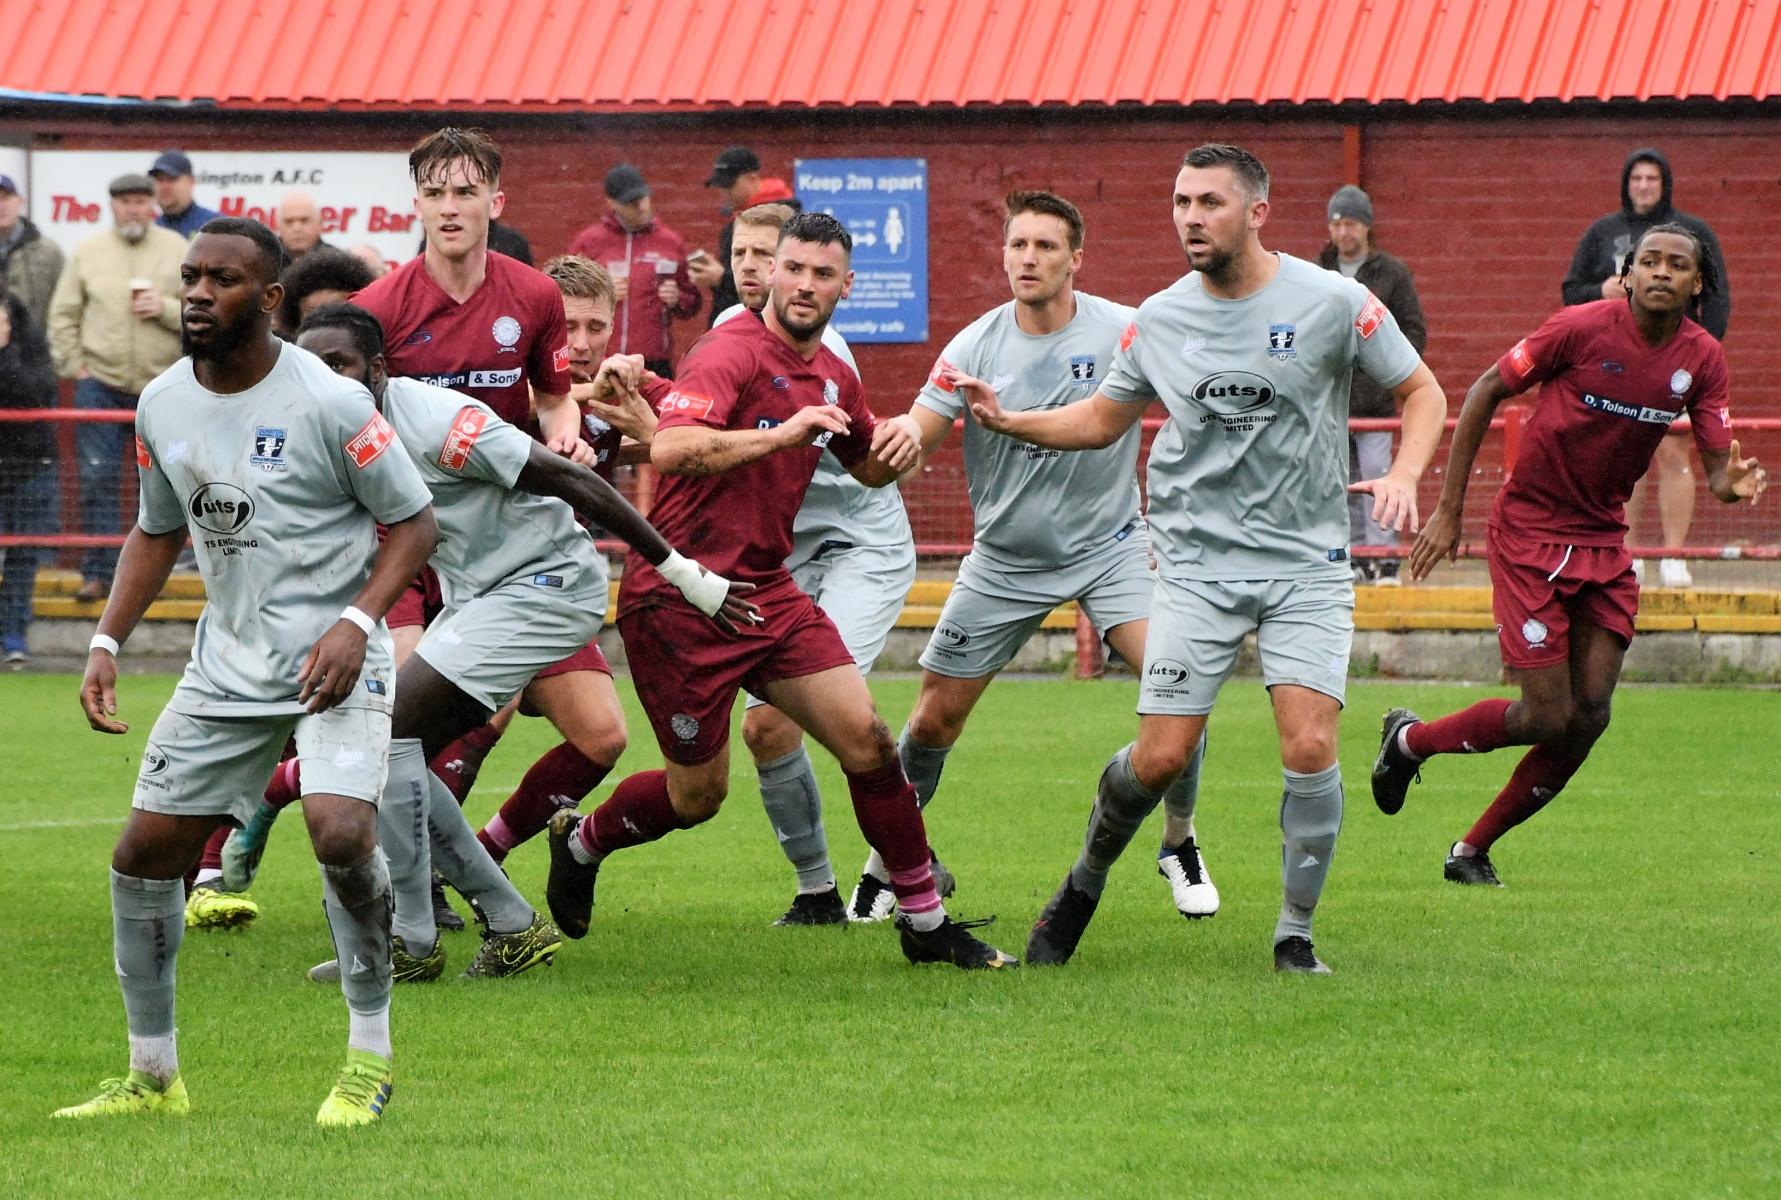 Workington-put-pressure-on-the-Dunston-goal-Ben-Challis